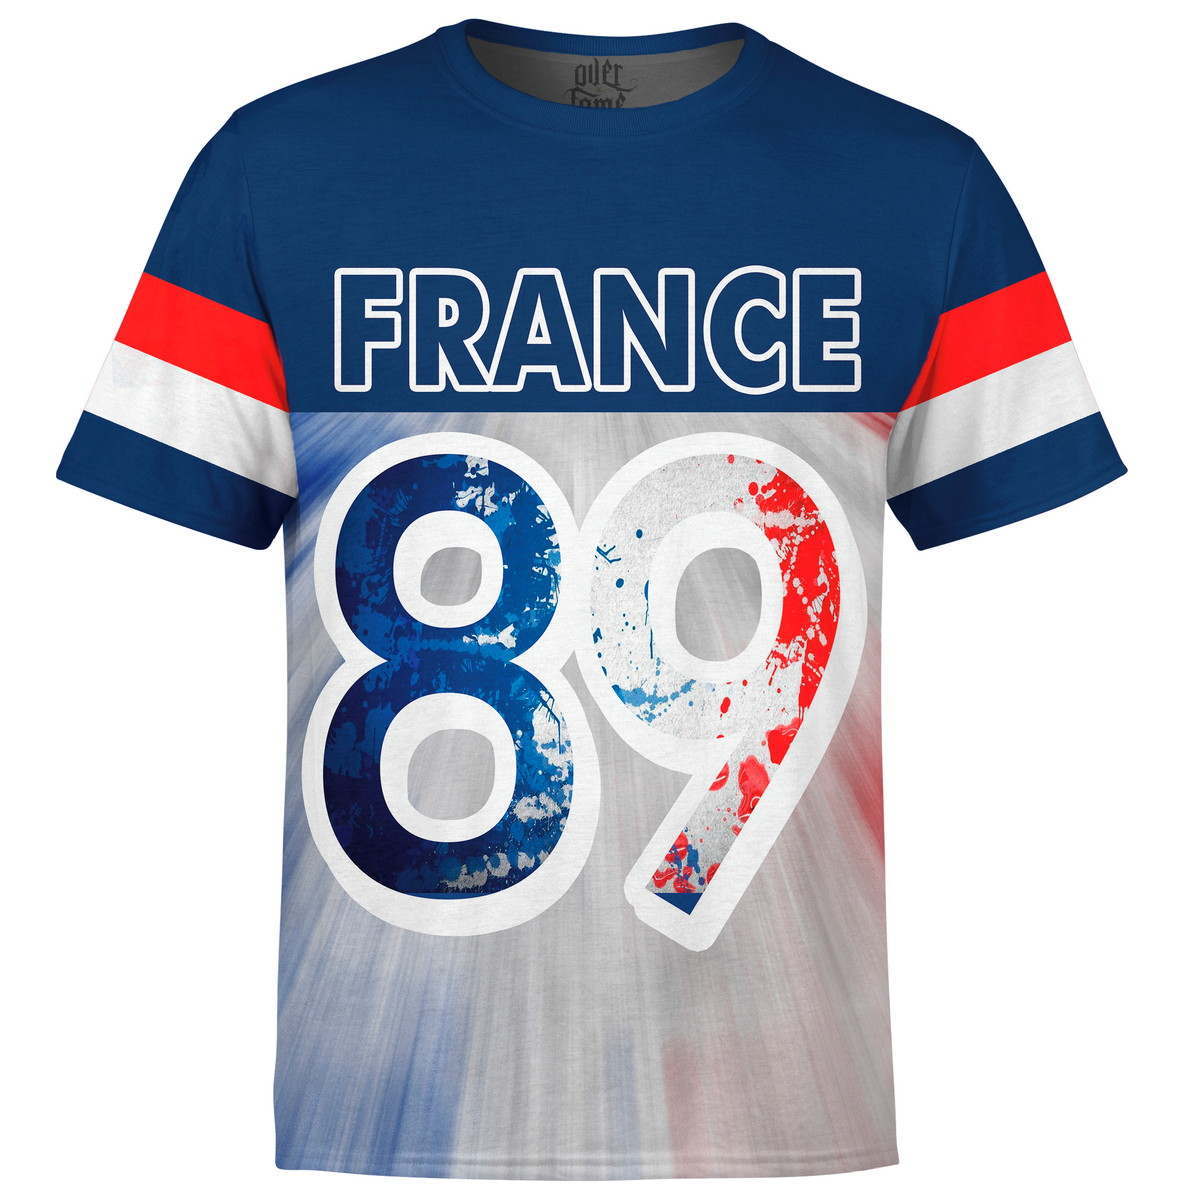 Camiseta masculina França France MD01 no Elo7  262b93844f467